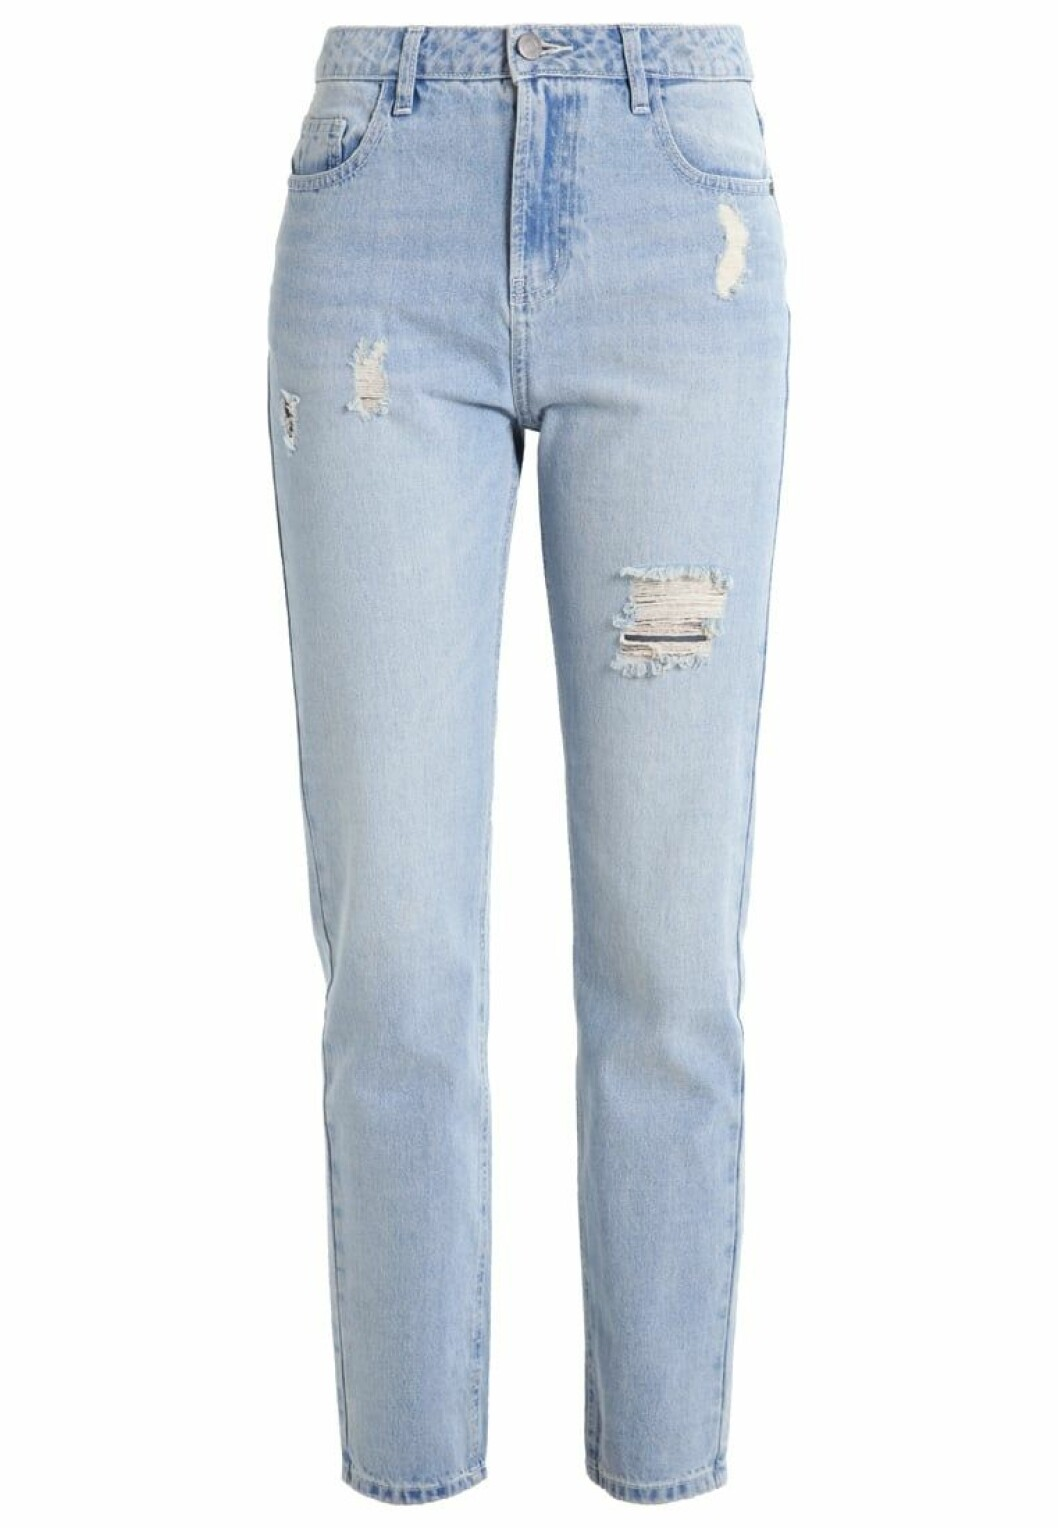 slitna trashade mom jeans